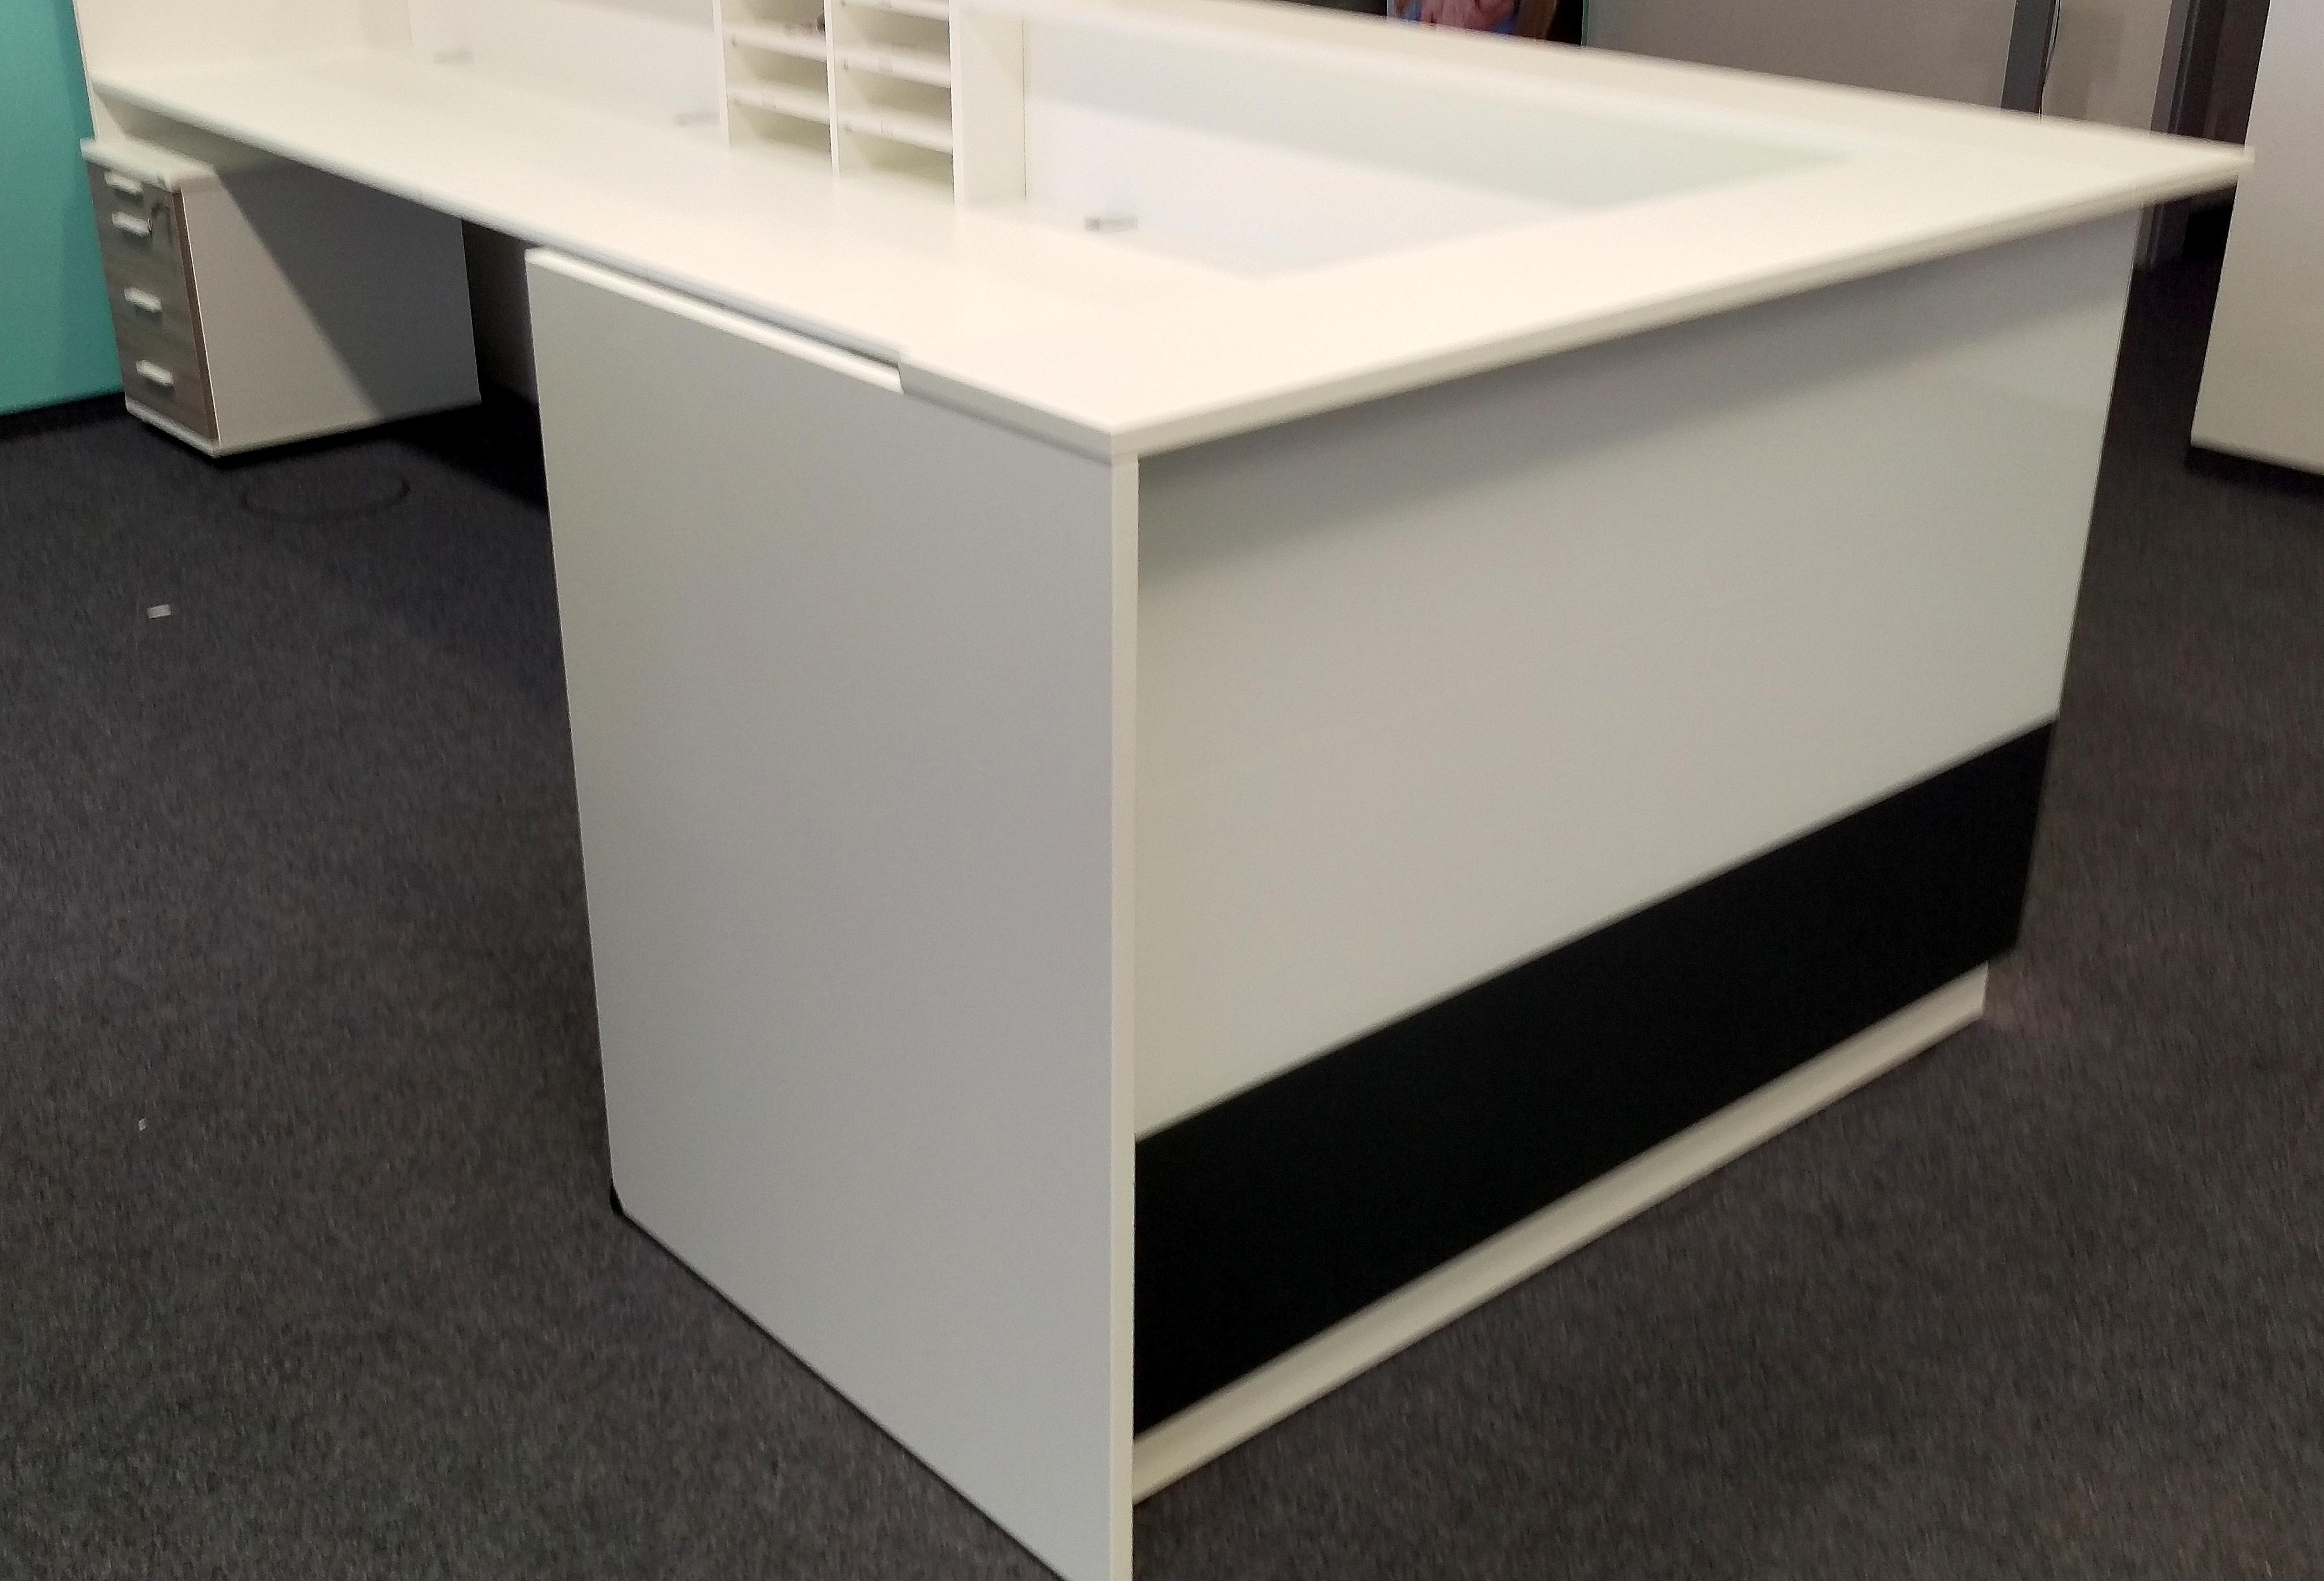 Febrü Empfangstheke 410 x 160 cm + Rollcontainer   GWV Büromöbel ...